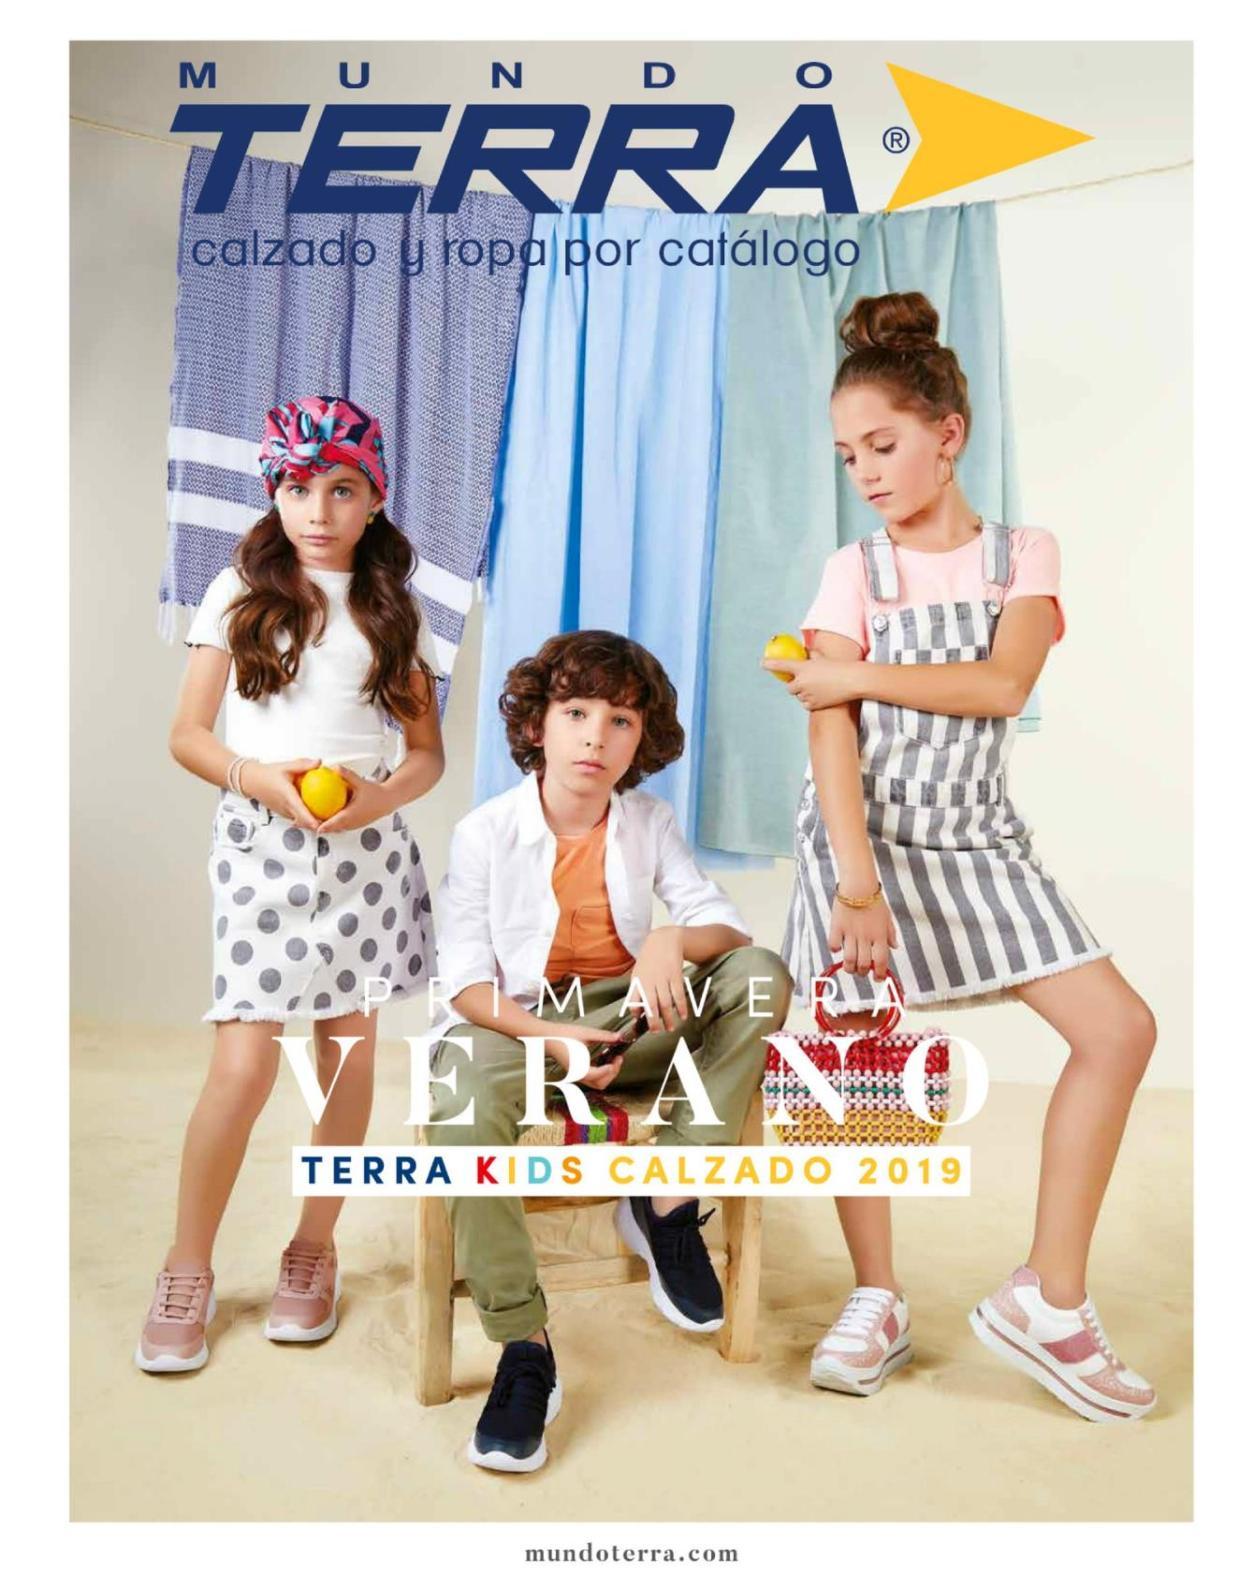 4d9eb6bb Calaméo - Mundo Terra - 2020/06/10 - Catálogo Mundo Terra - Terra Kids